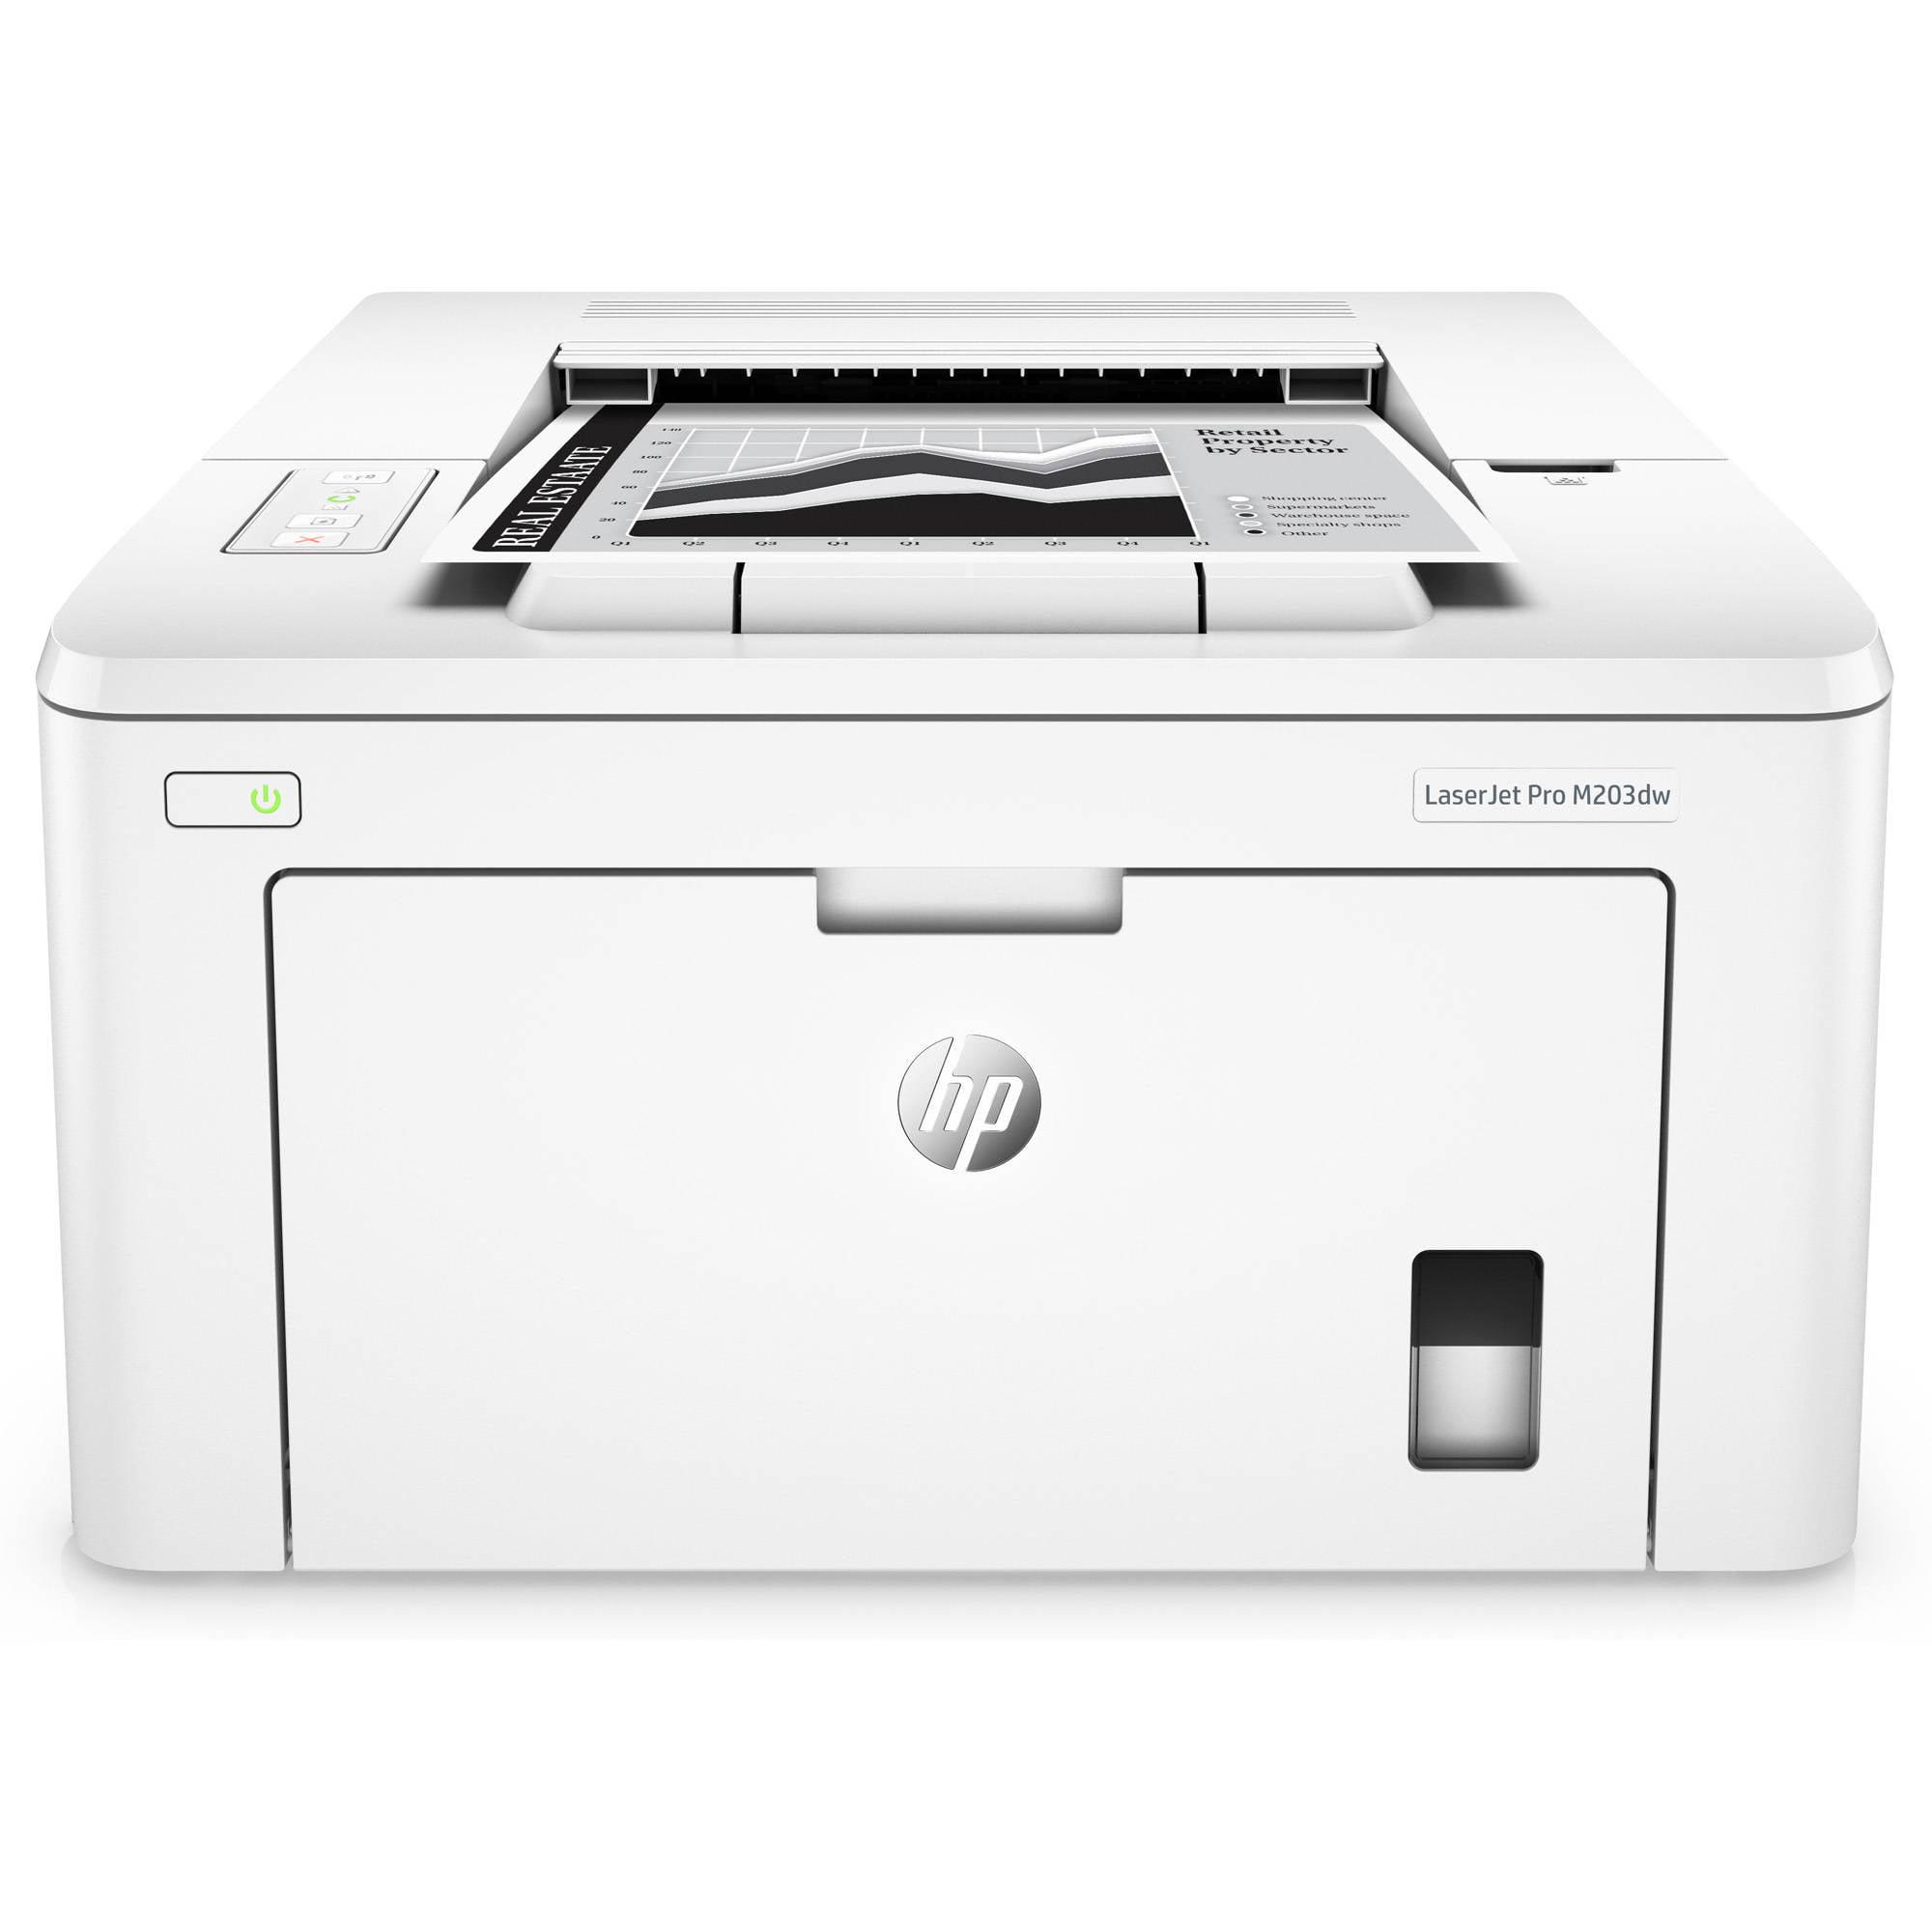 Recertified HP G3Q47AR#BGJ LaserJet Pro M203dw Printer